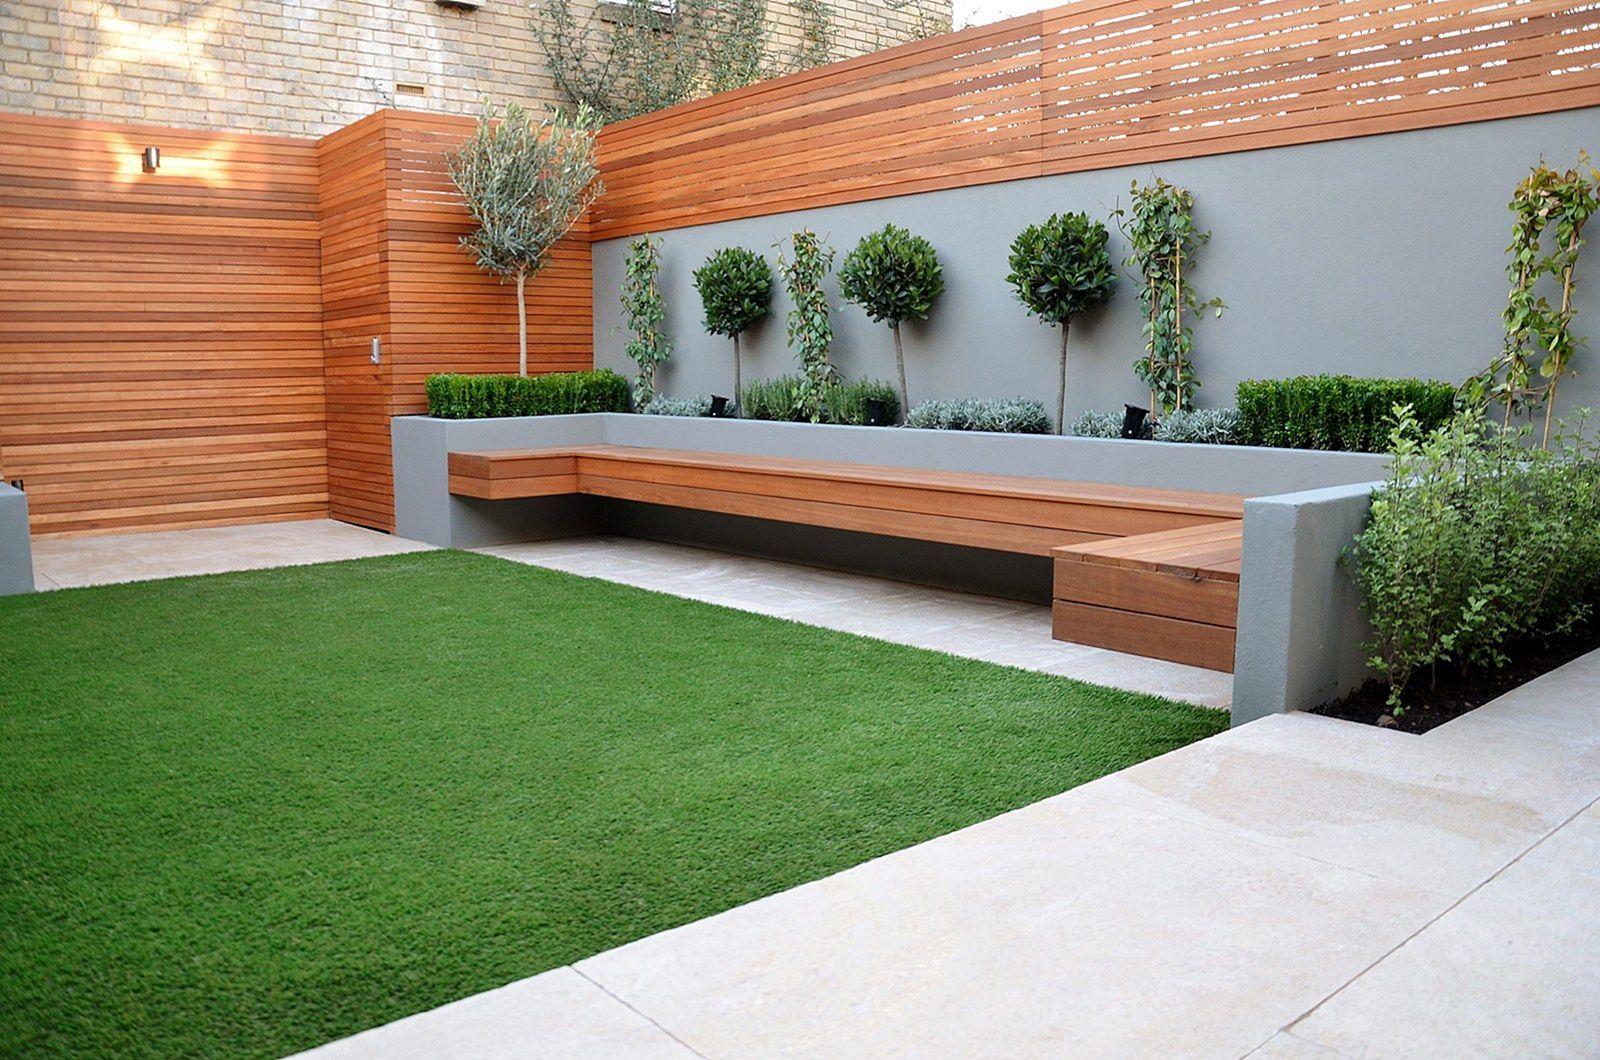 Phenomenal 30 Modern Fence Garden Design That You Must Have Https Dsgndcr Com Gard Modern Garden Design Low Maintenance Garden Design Backyard Garden Design